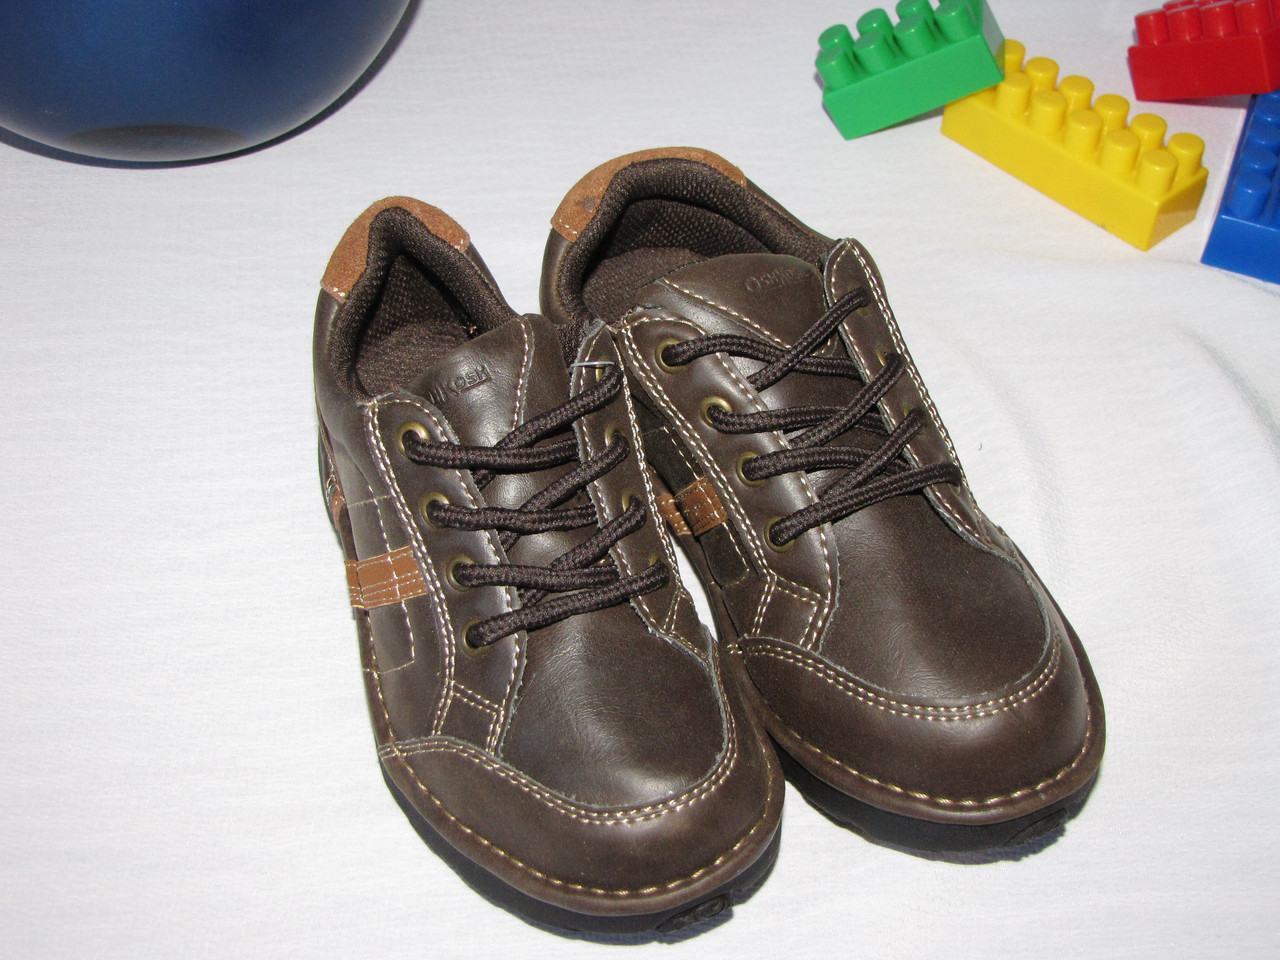 Туфли кожаные OshKosh оригинал размер 27 коричневые 08003/02